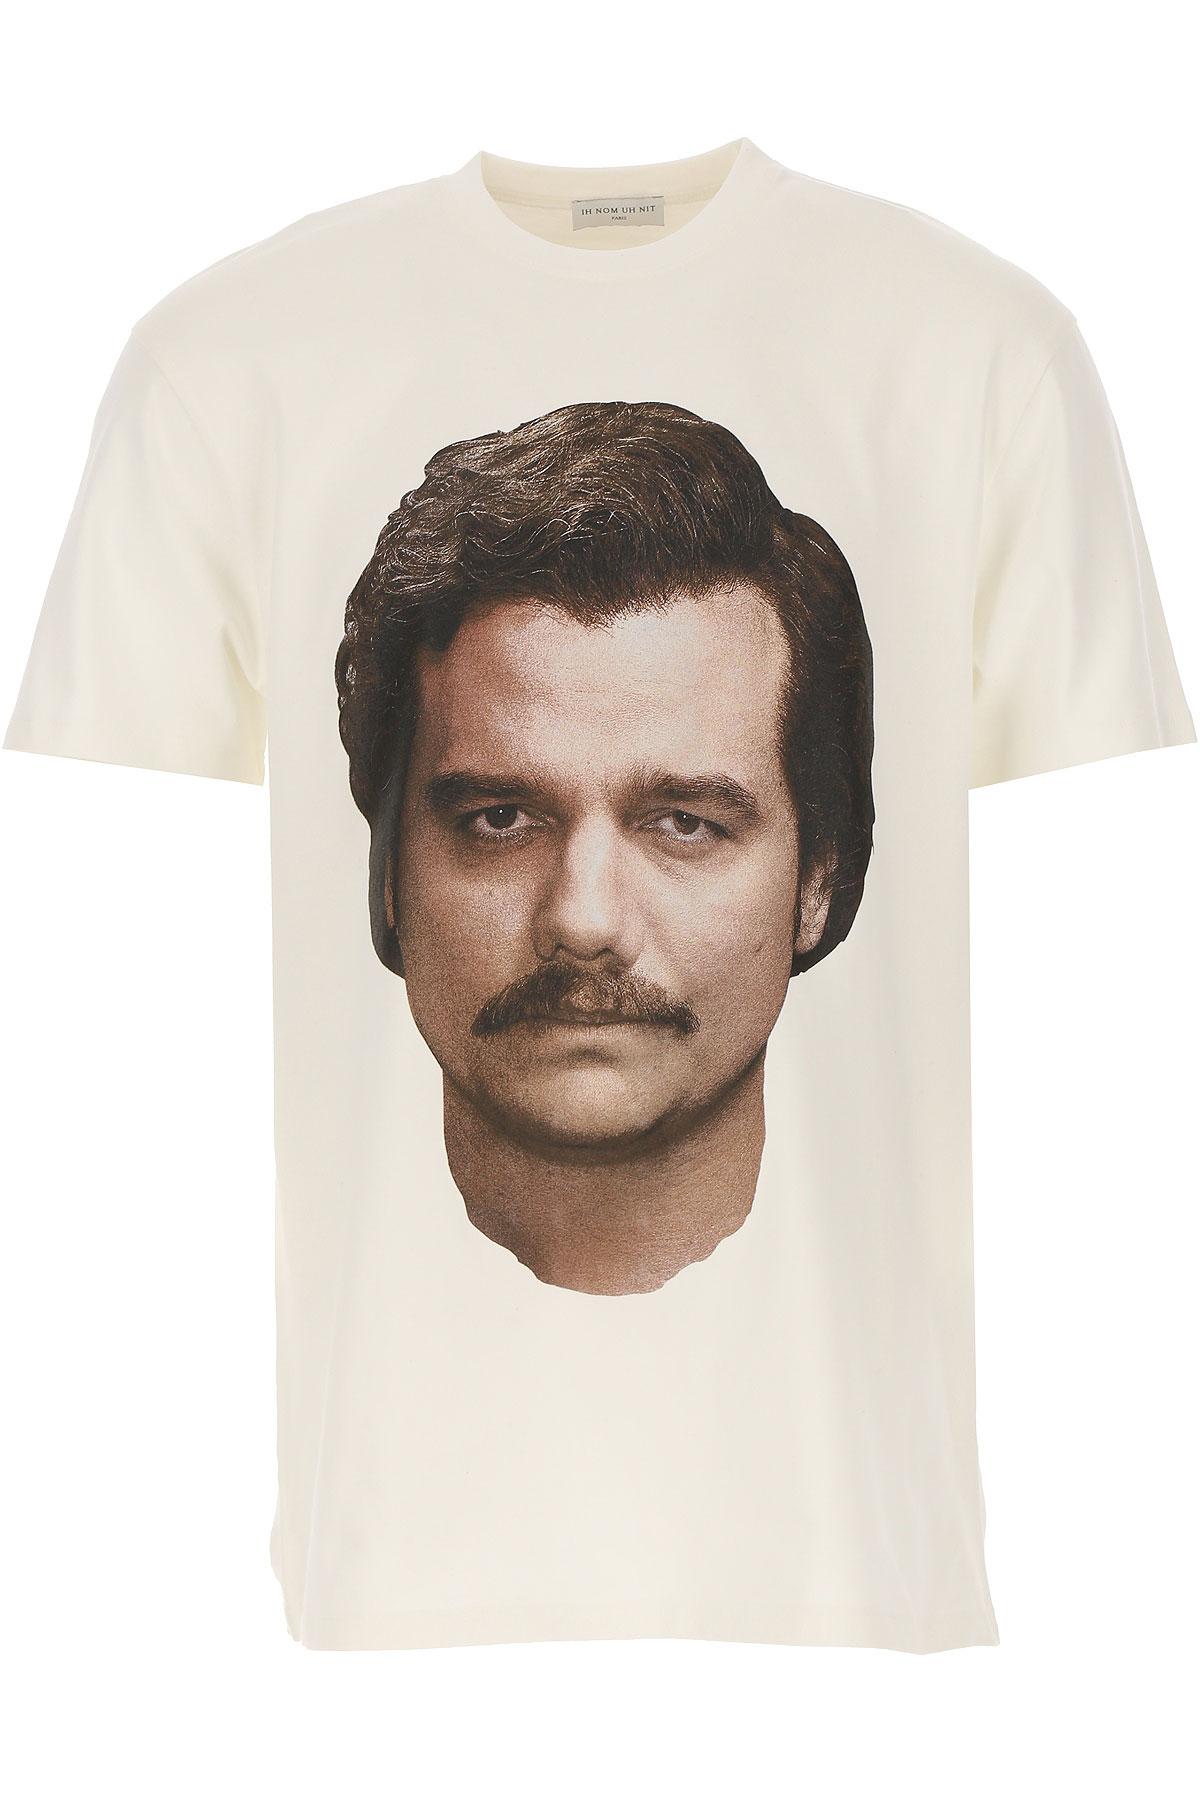 Ih Nom Uh Nit T-Shirt for Men On Sale, White, Cotton, 2019, L M S